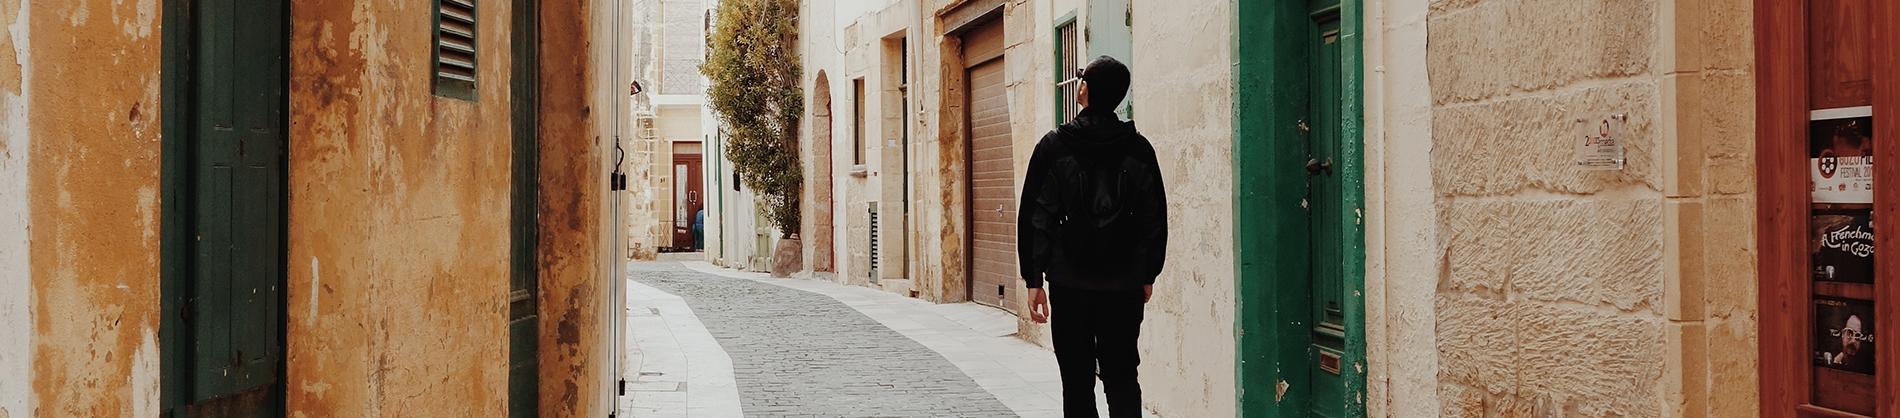 A man walking through a old street